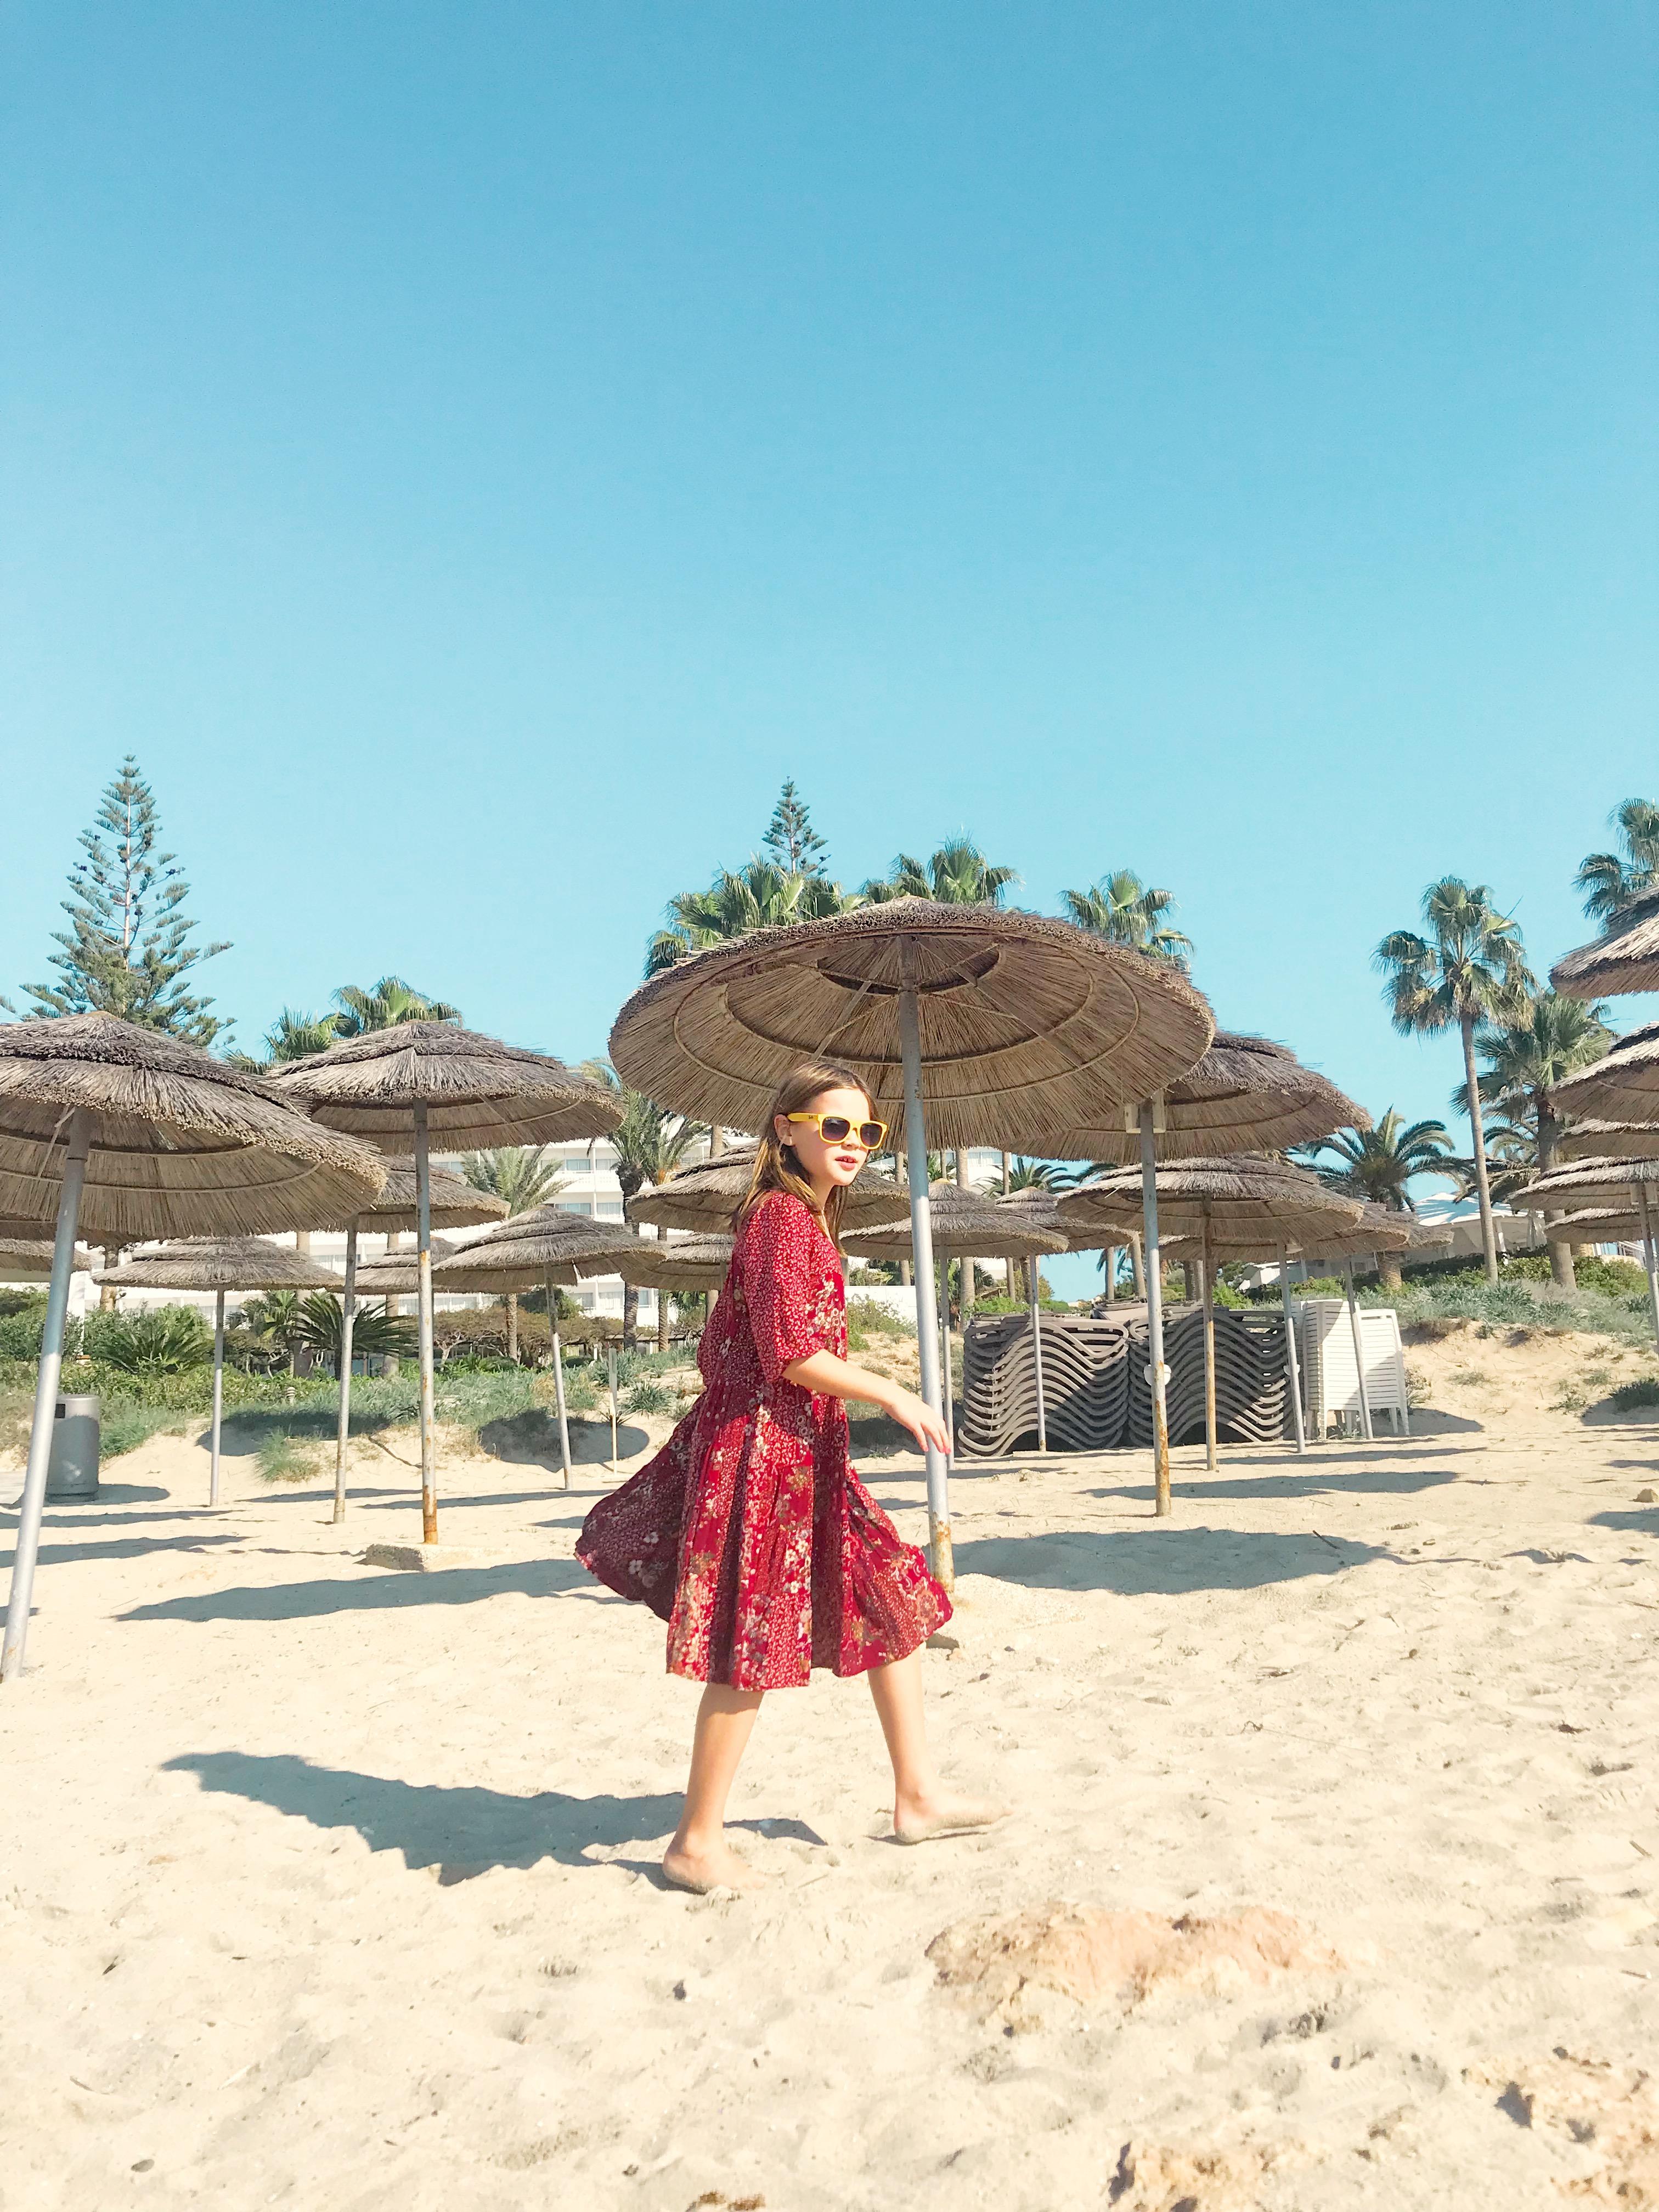 My gypsy babe am Strand von Nissi Beach, Zypern, Dezember 2018.